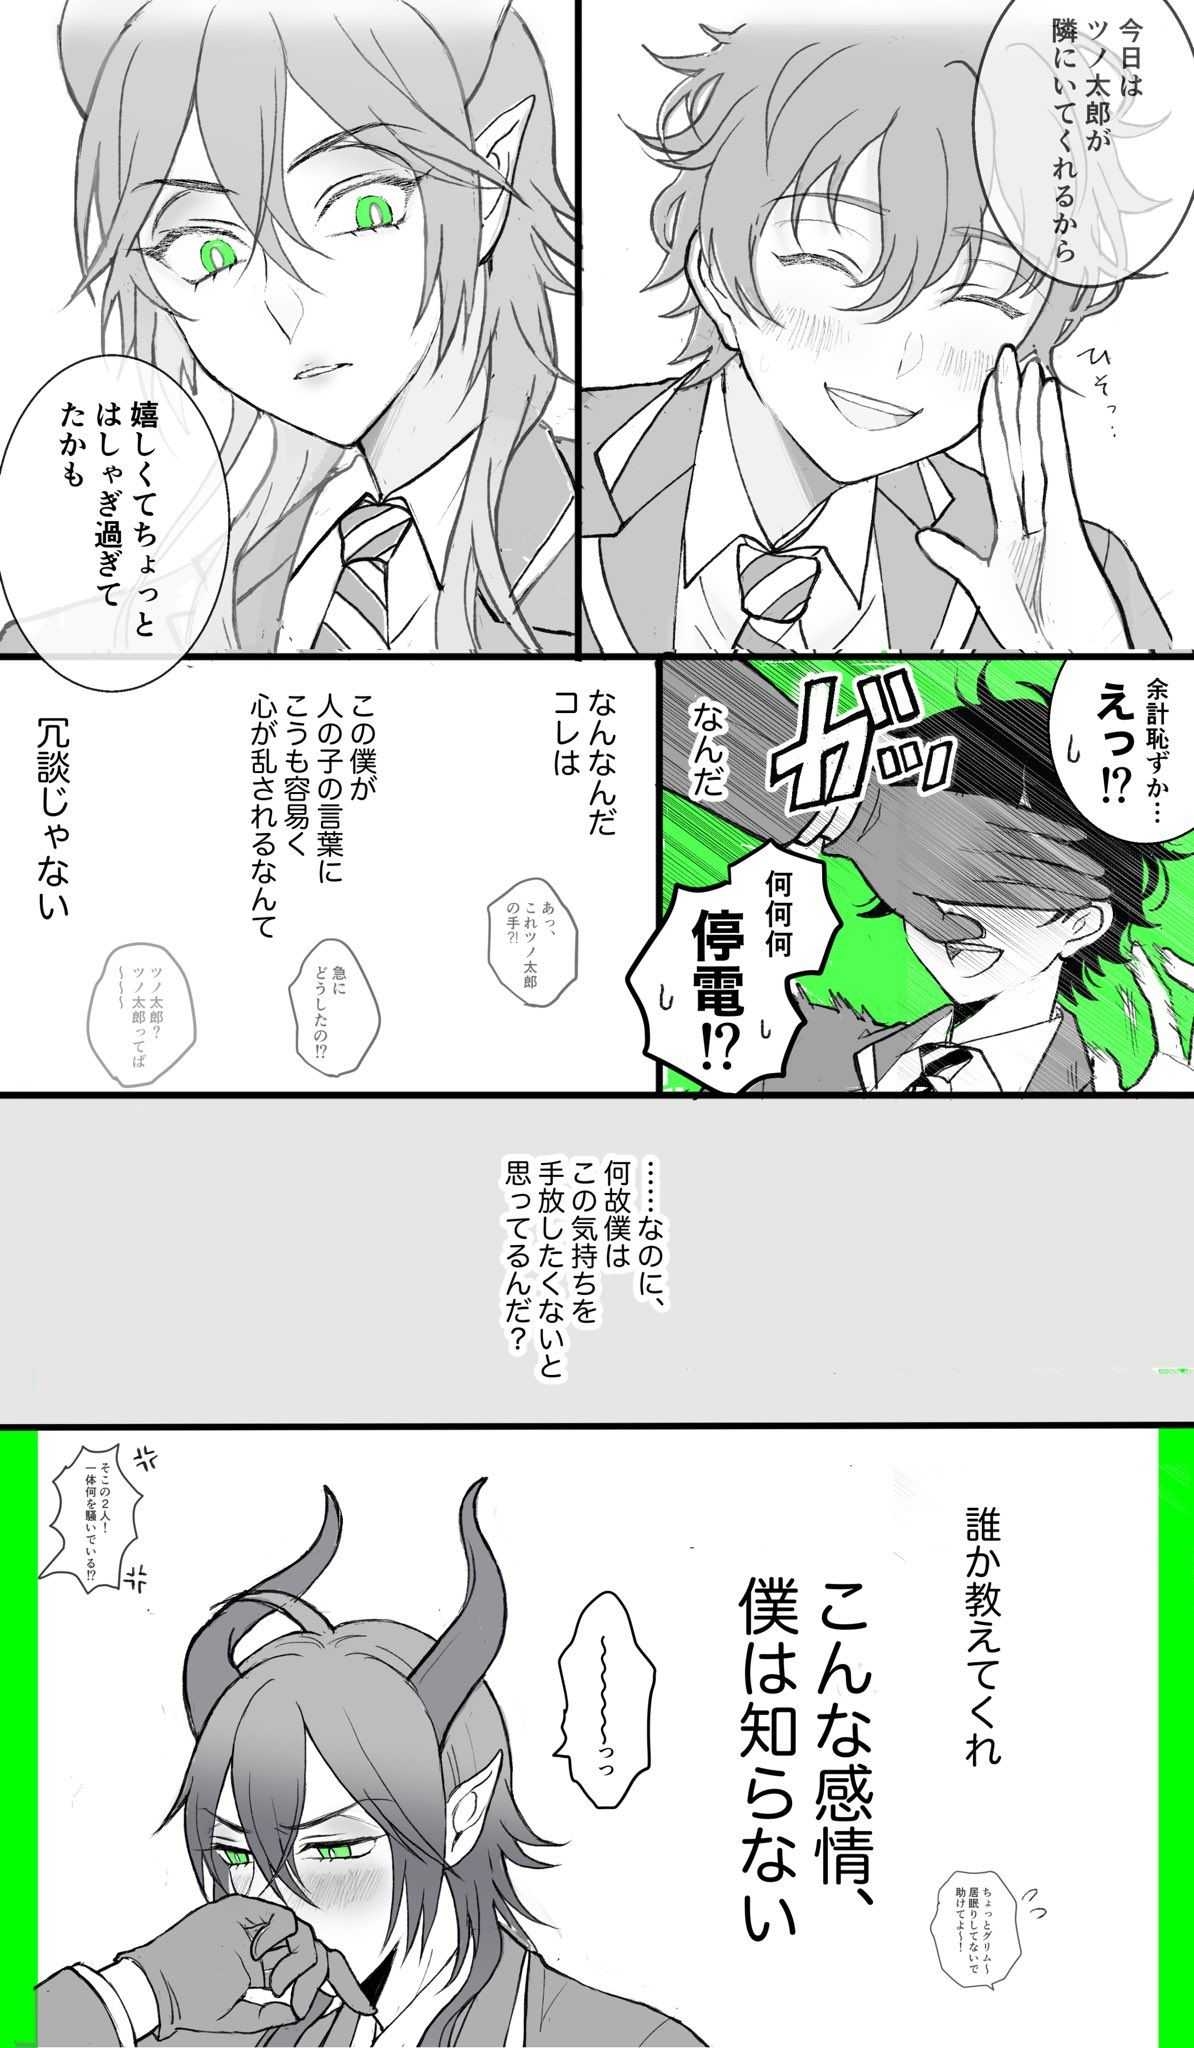 Twitter イラスト 構図 フリー 漫画 イラスト